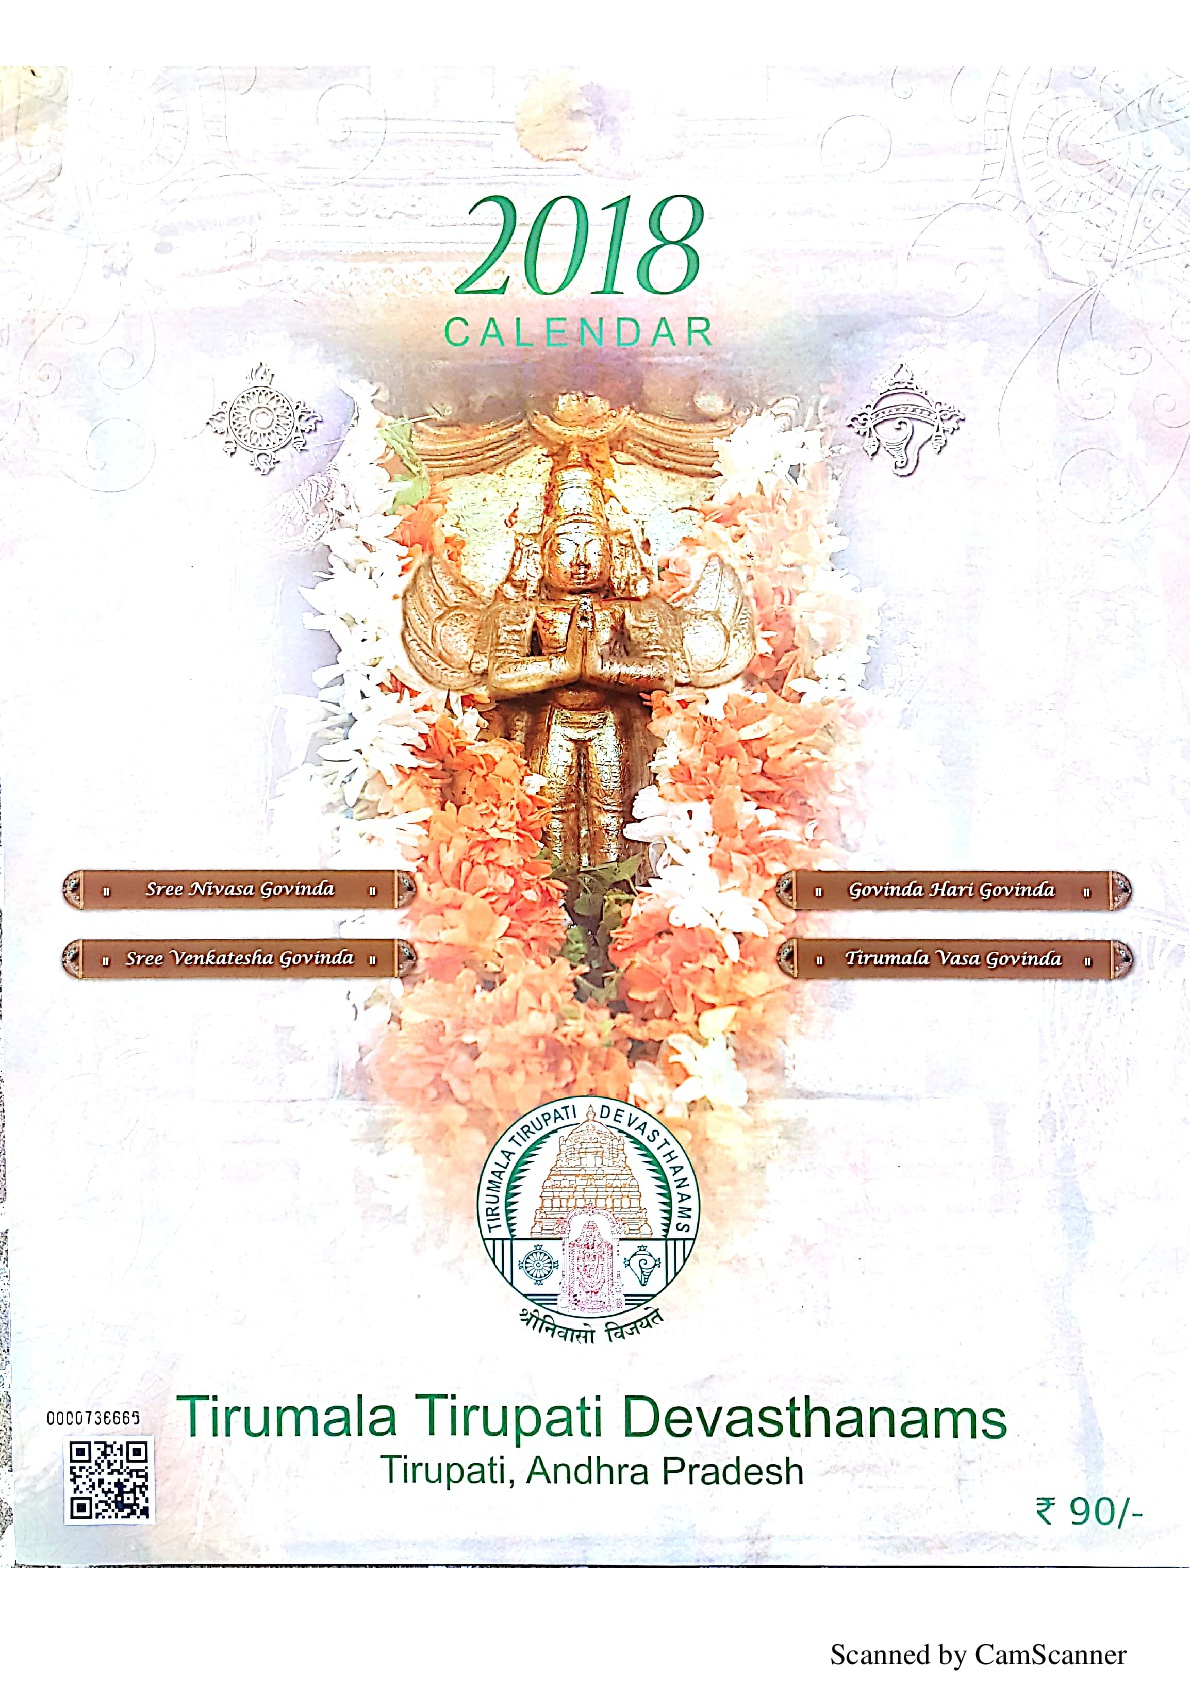 Calendar Cover 2018 : Ttd calendar tirumala tirupati temple